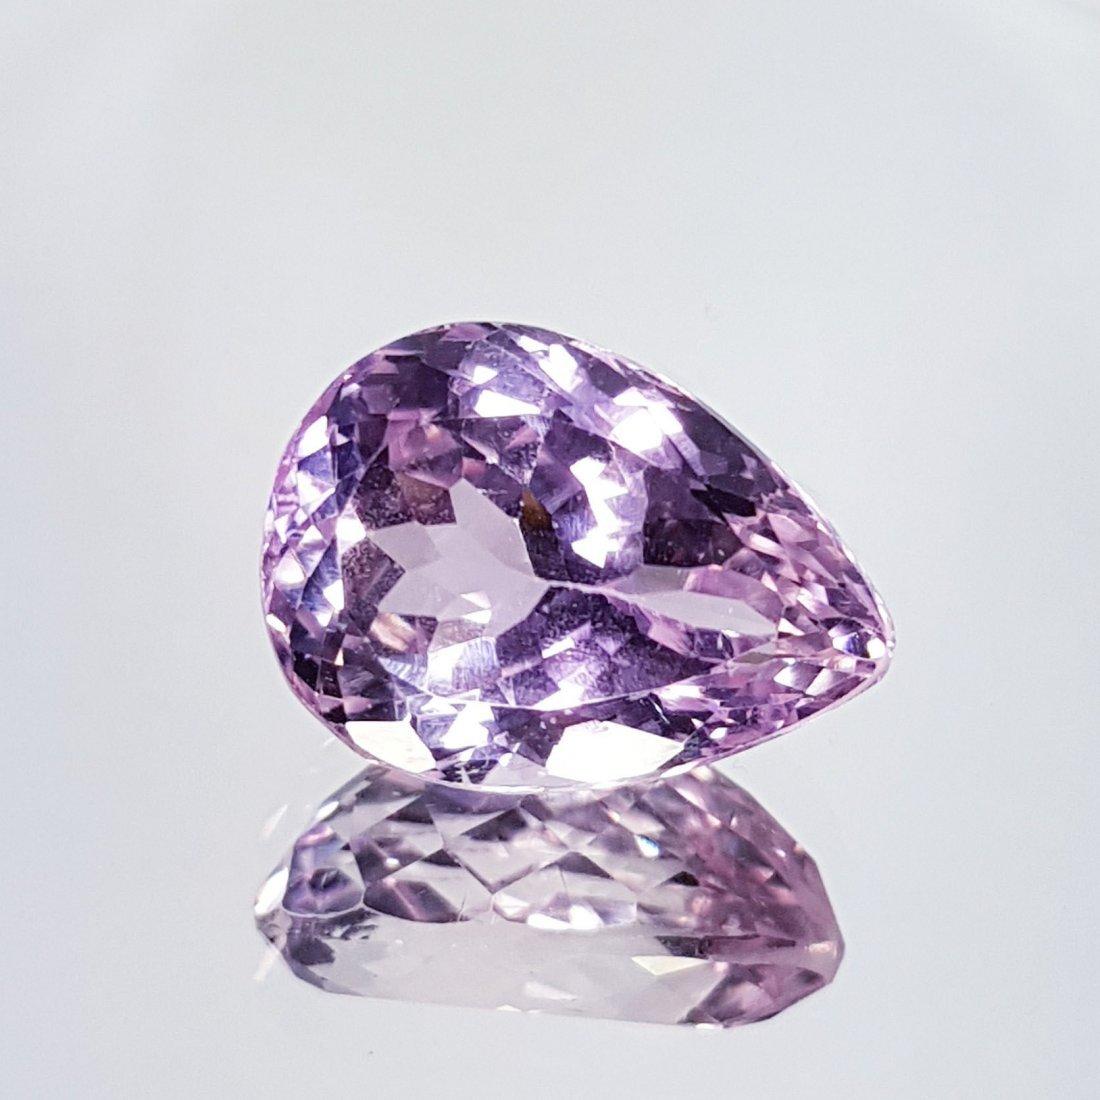 Pink Kunzite - 15.21 ct - 2